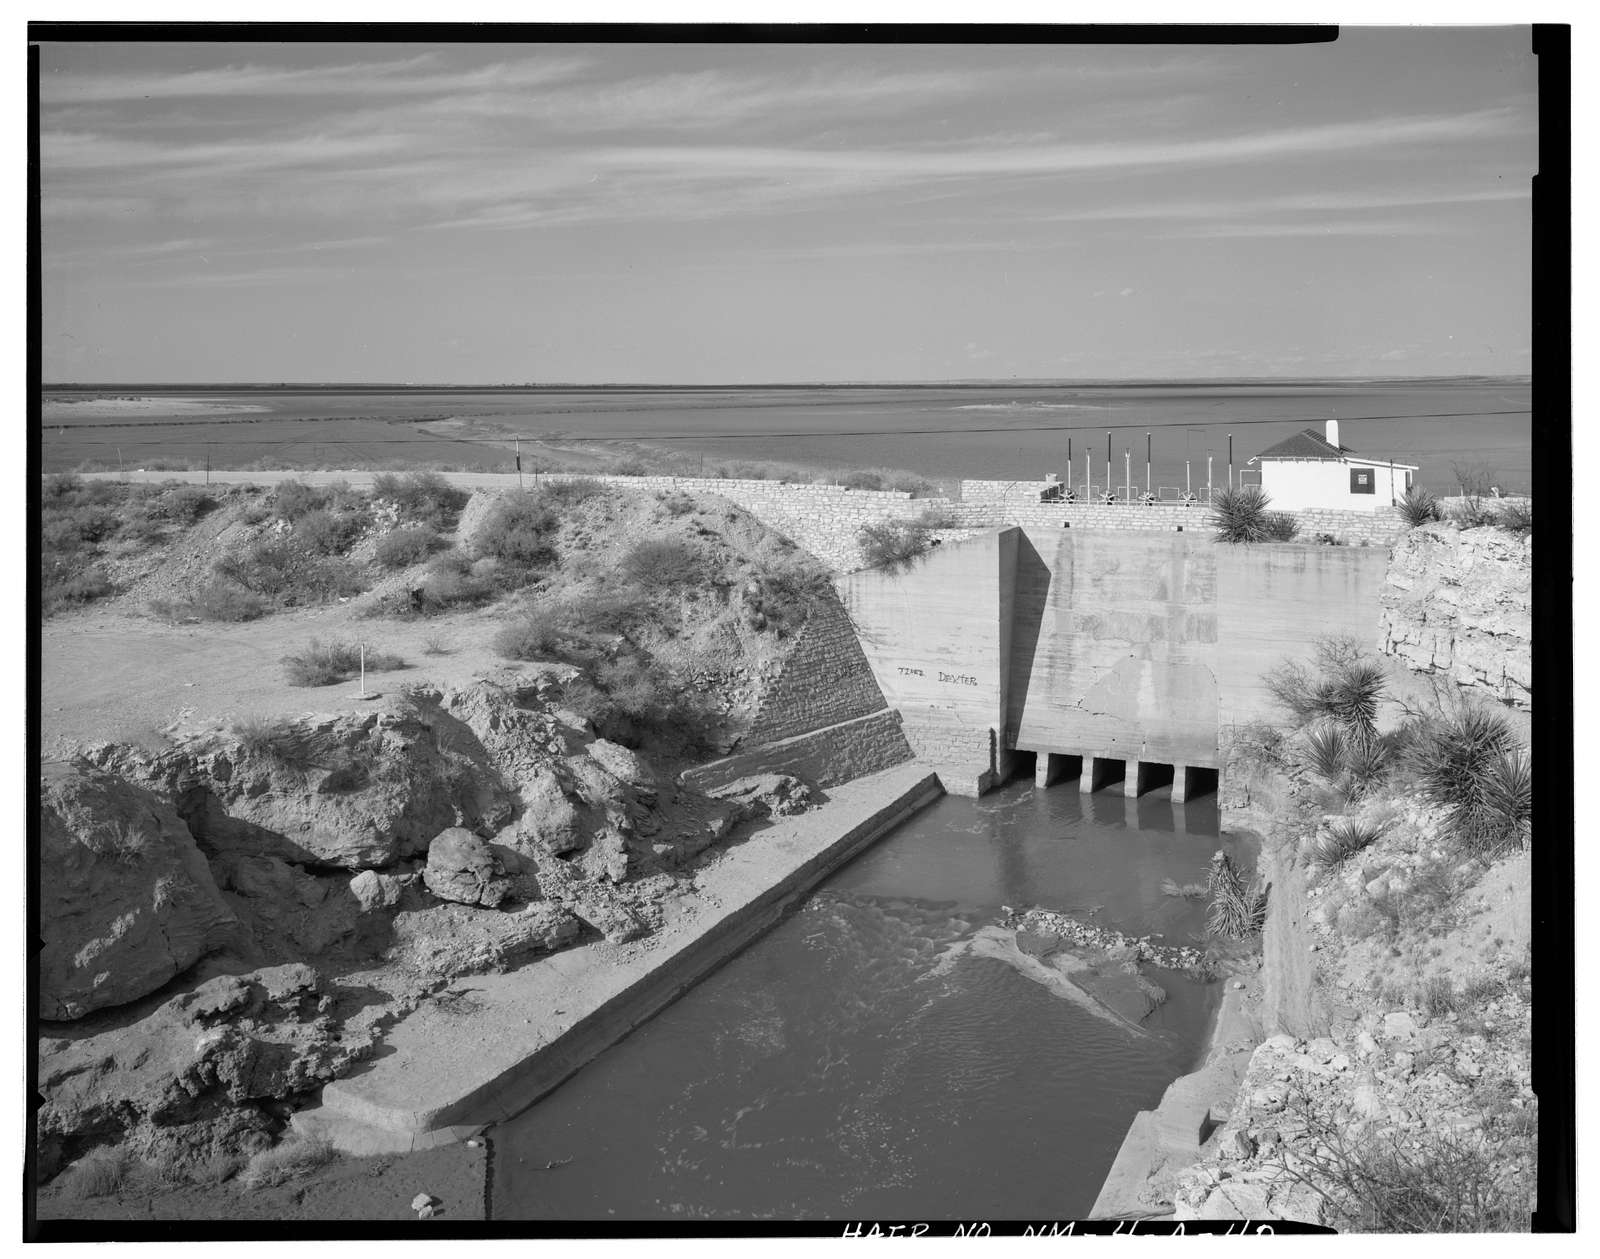 Carlsbad Irrigation District, McMillan Dam, On Pecos River, 13 miles North of Carlsbad, Carlsbad, Eddy County, NM